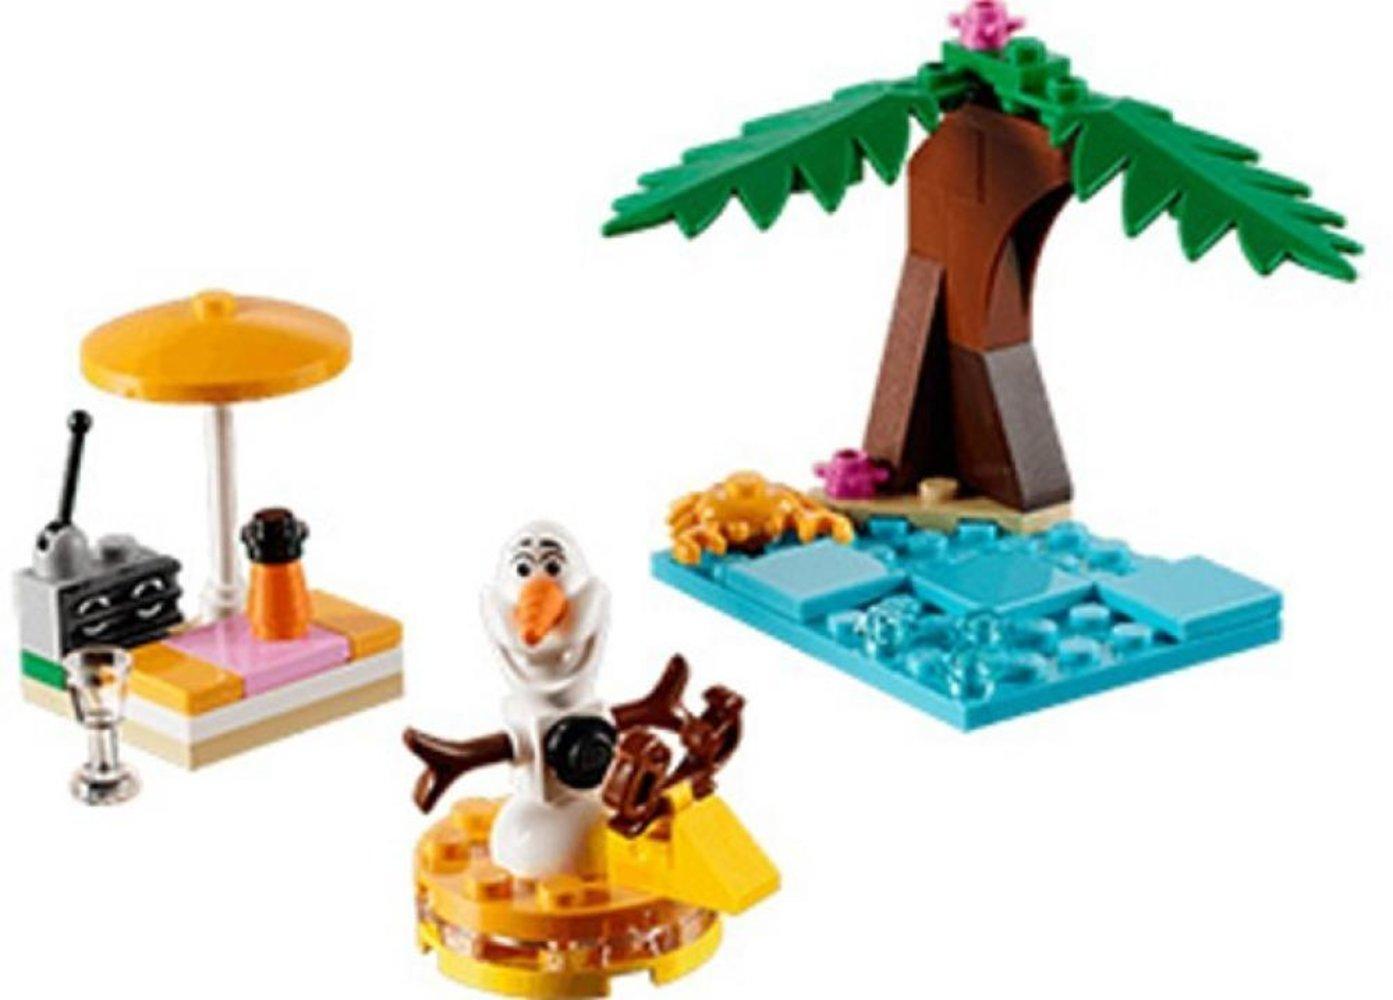 Olaf's Summertime Fun